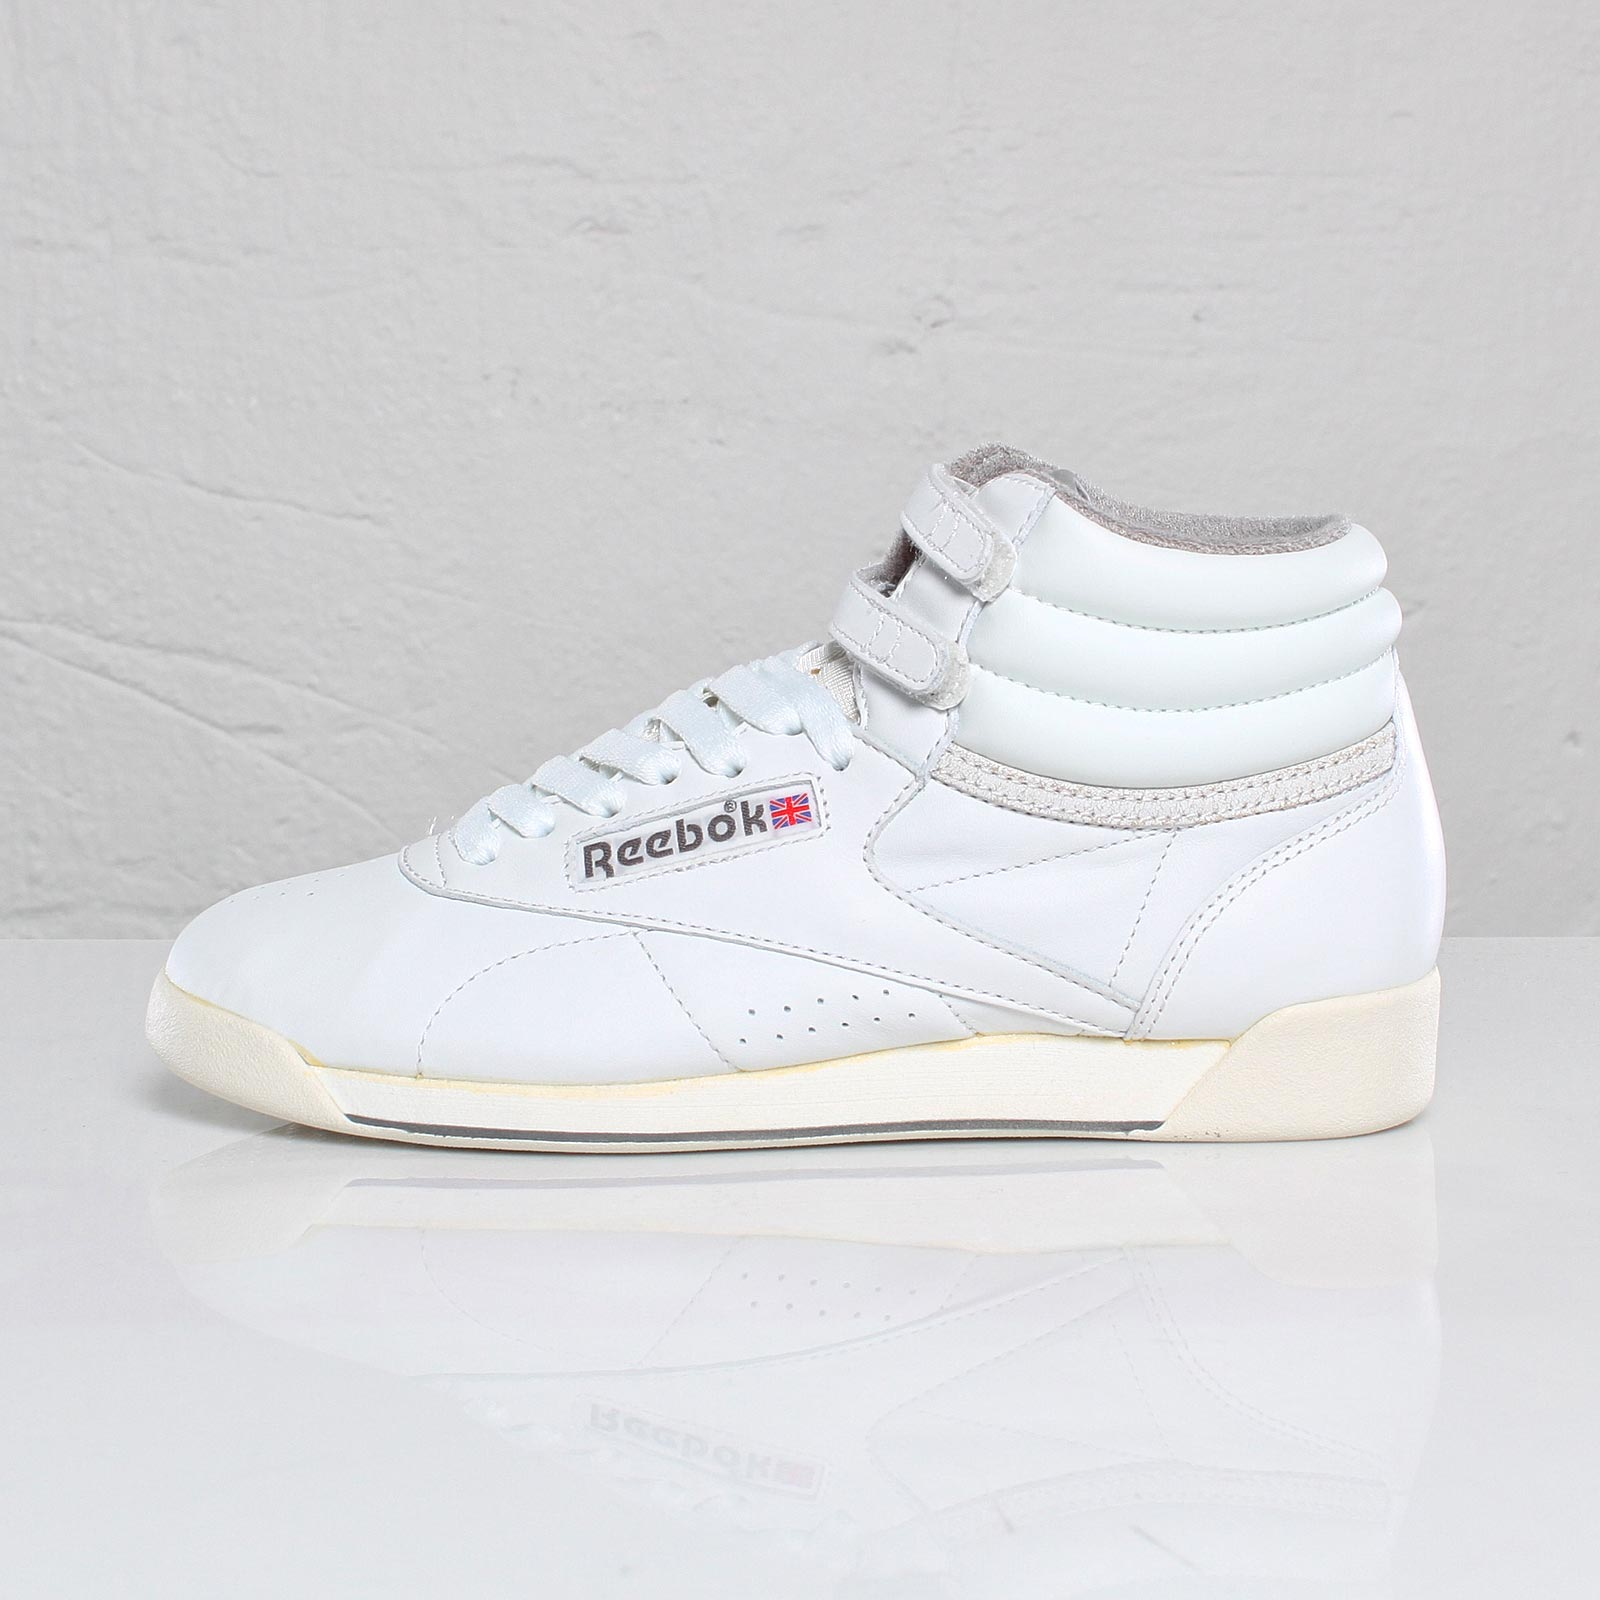 d2ad54f9c Reebok Freestyle Hi Vintage Intl - 101739 - Sneakersnstuff ...